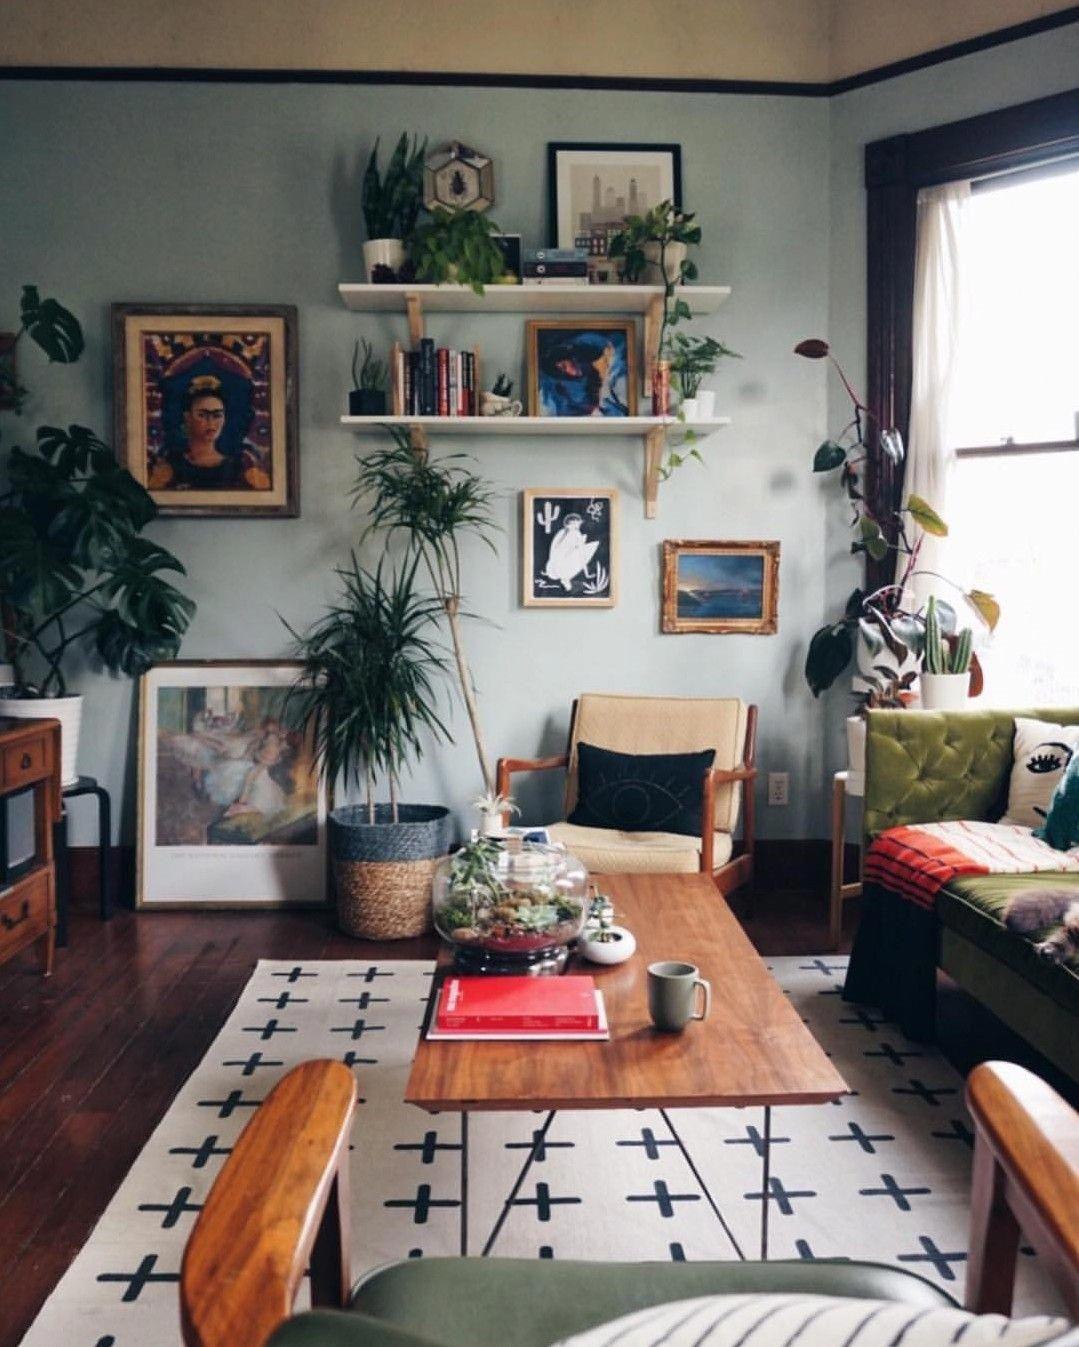 Wtvmaddy Room Roomdecor Design Eclectic Plants Livingroom Rugs Carpet Art Artwork I Eclectic Living Room Living Room Designs Rustic Living Room Living room ideas eclectic